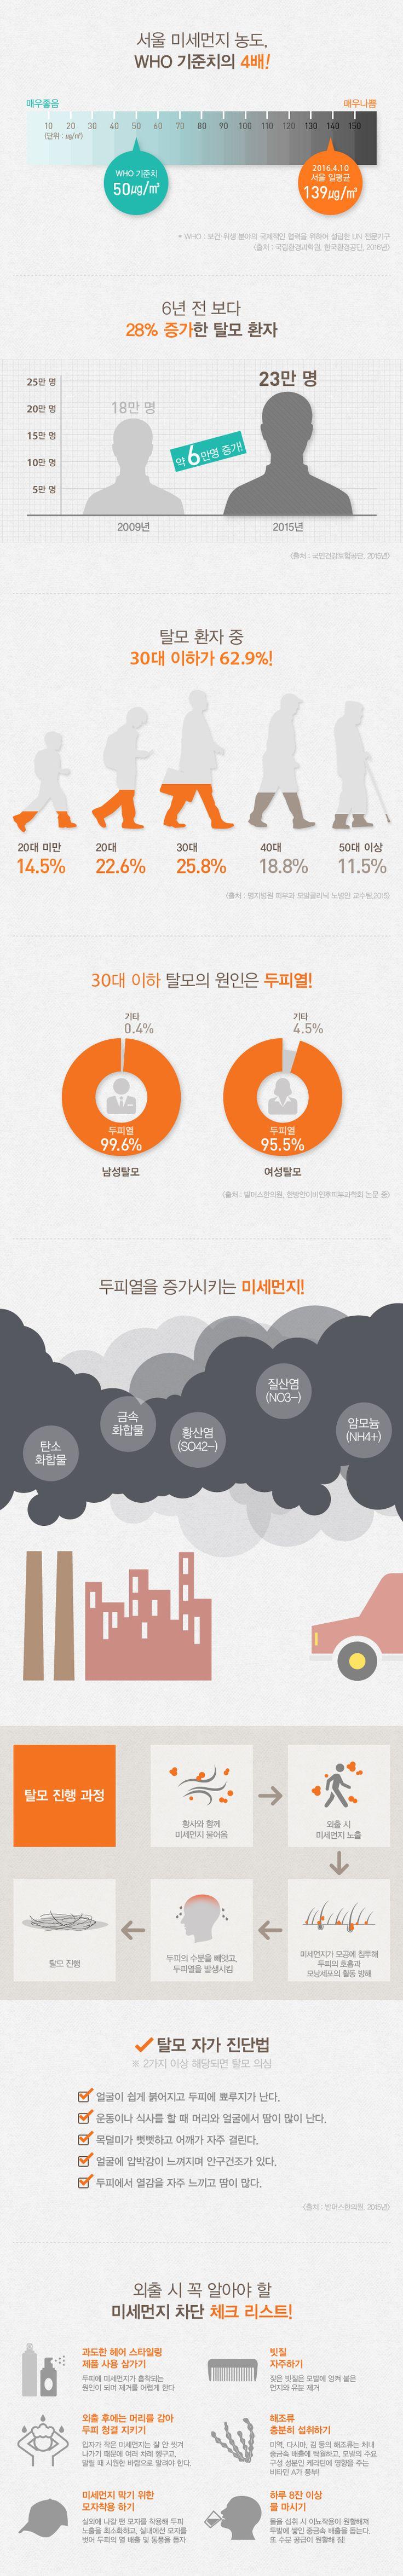 [Infographic] 봄철 탈모의 원인 '미세먼지'에 관한 인포그래픽